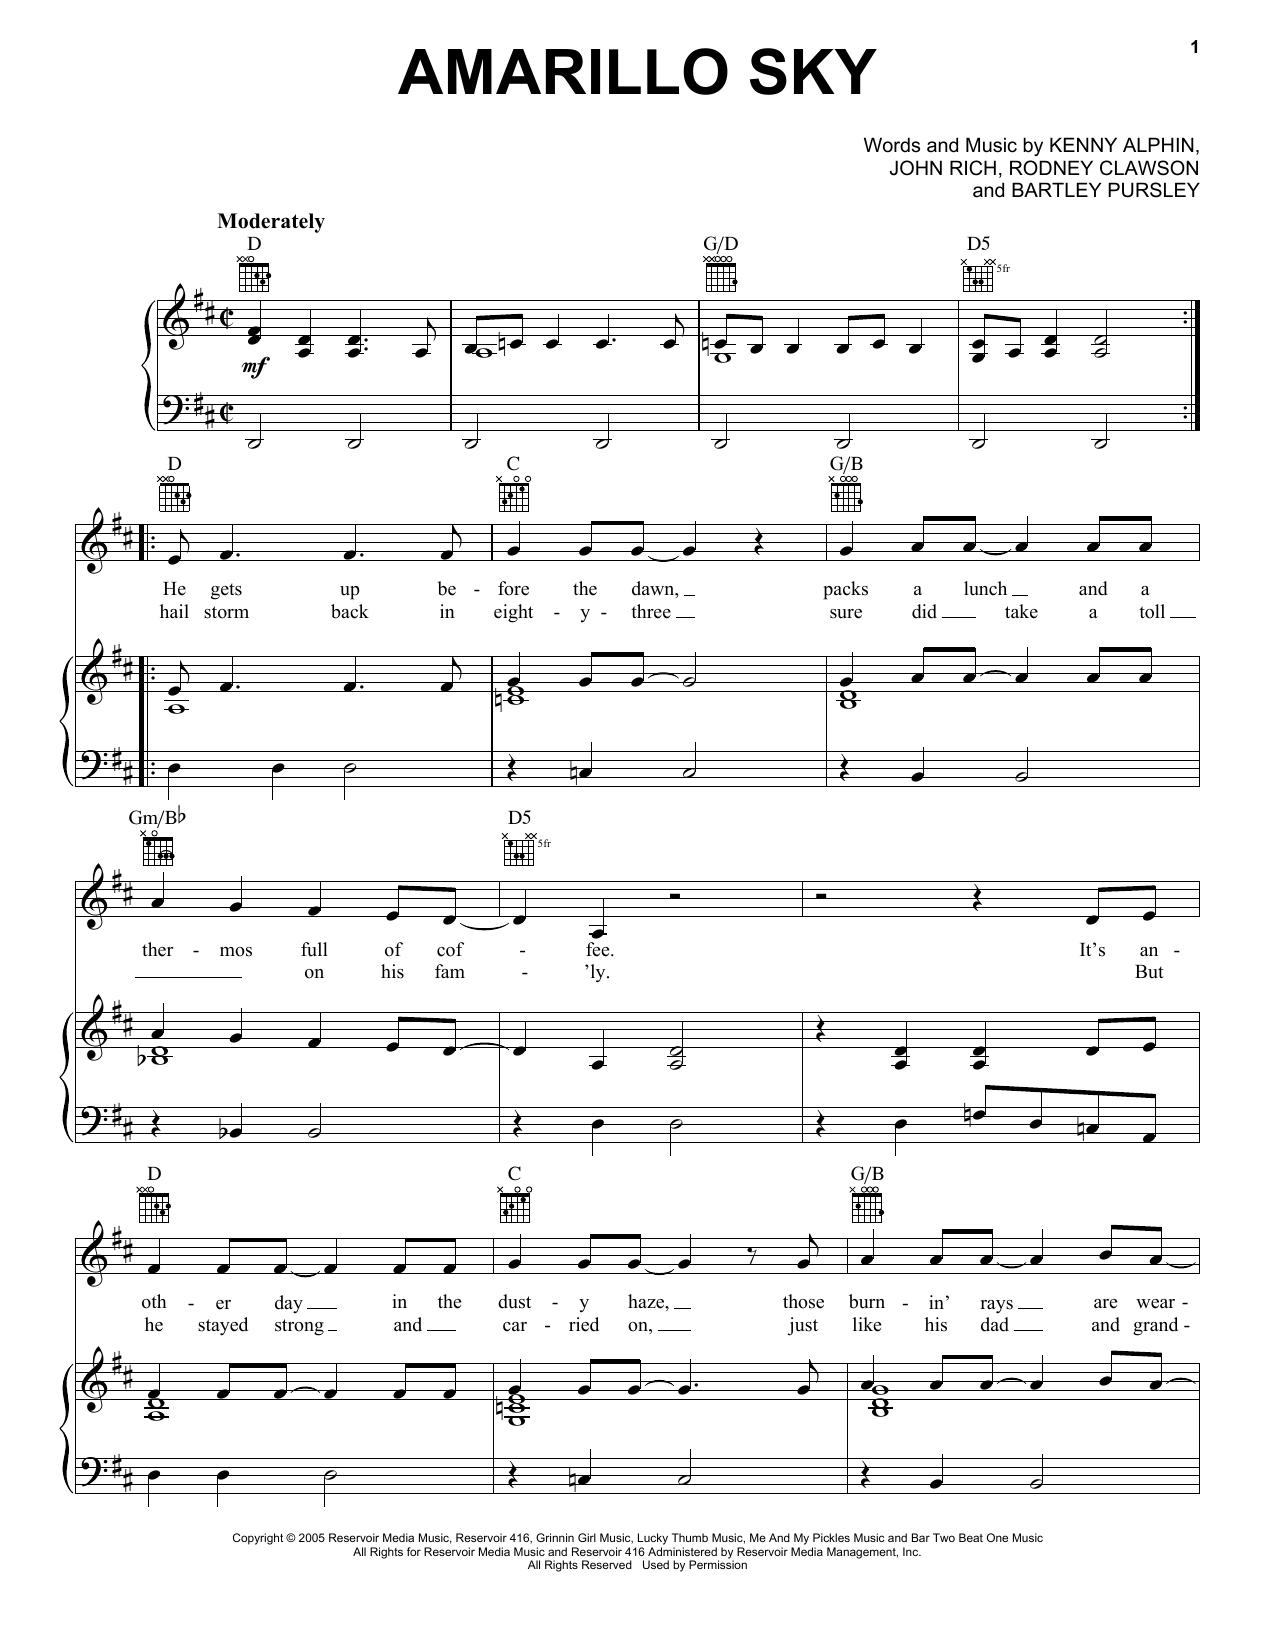 Amarillo Sky Sheet Music